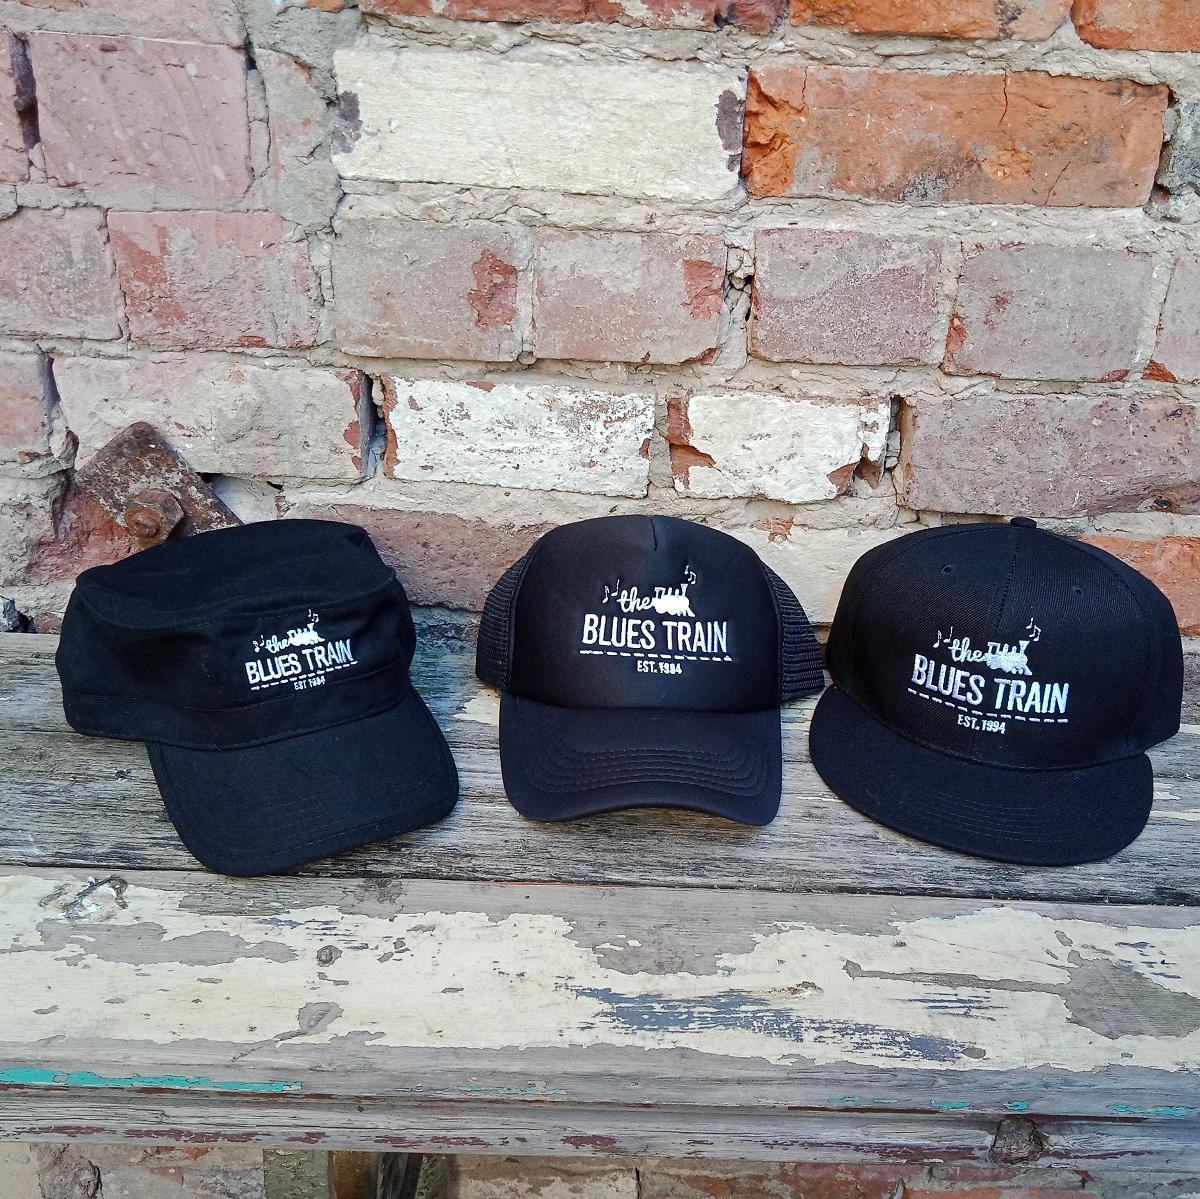 Blues Train Cap - 3 Styles